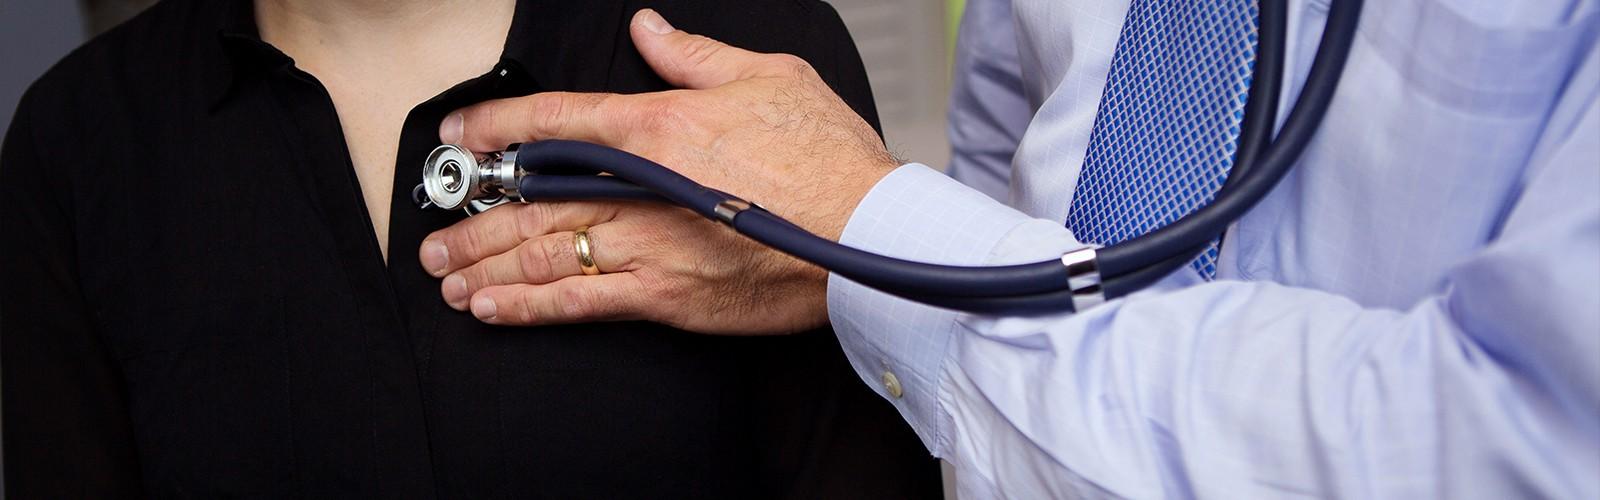 Doctor Examining Patient, Concierge Medicine in Newton & Wellesley MA